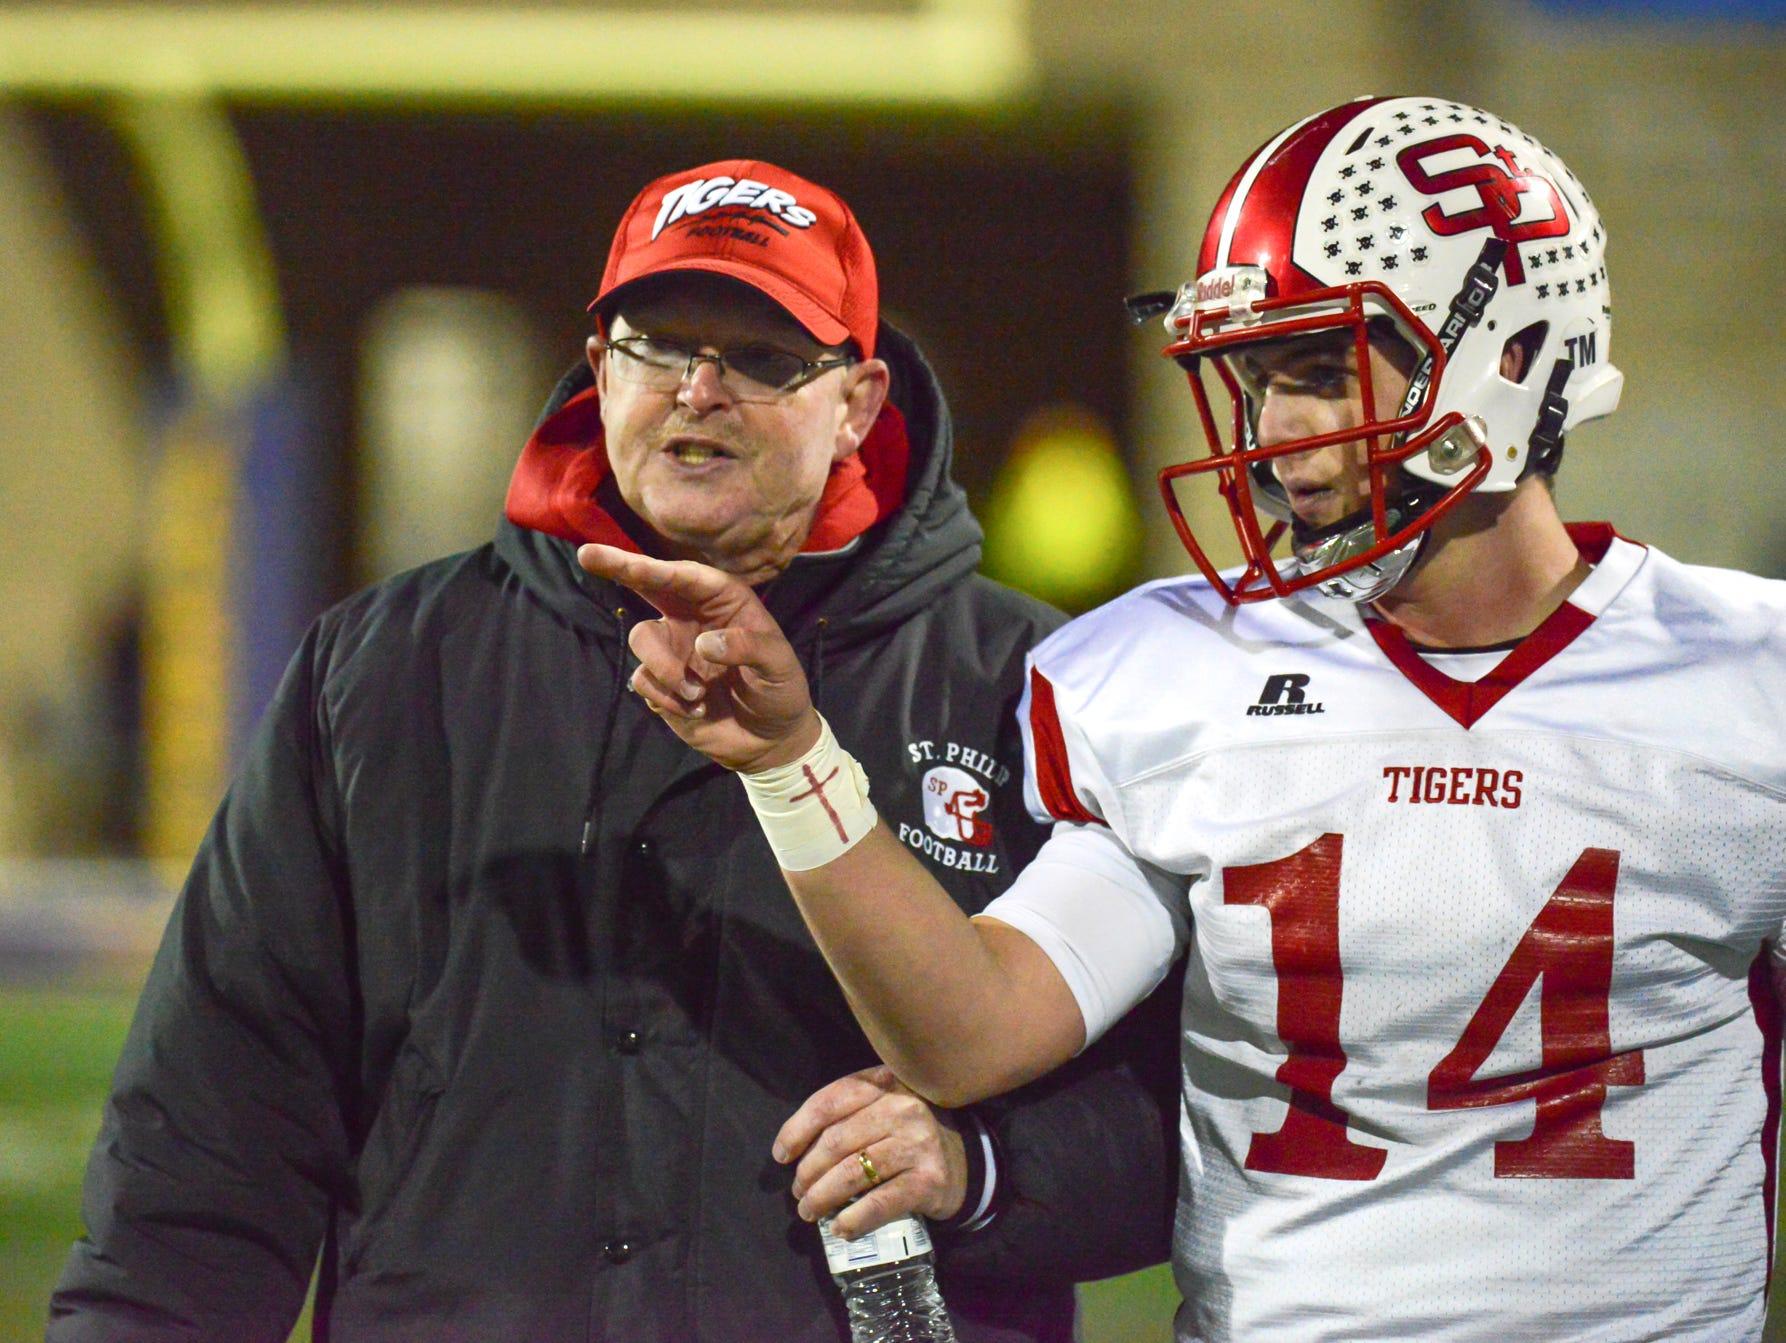 St. Philip quarterback Brendan Gausselin talks with head coach David Downey during a break in action Friday night.